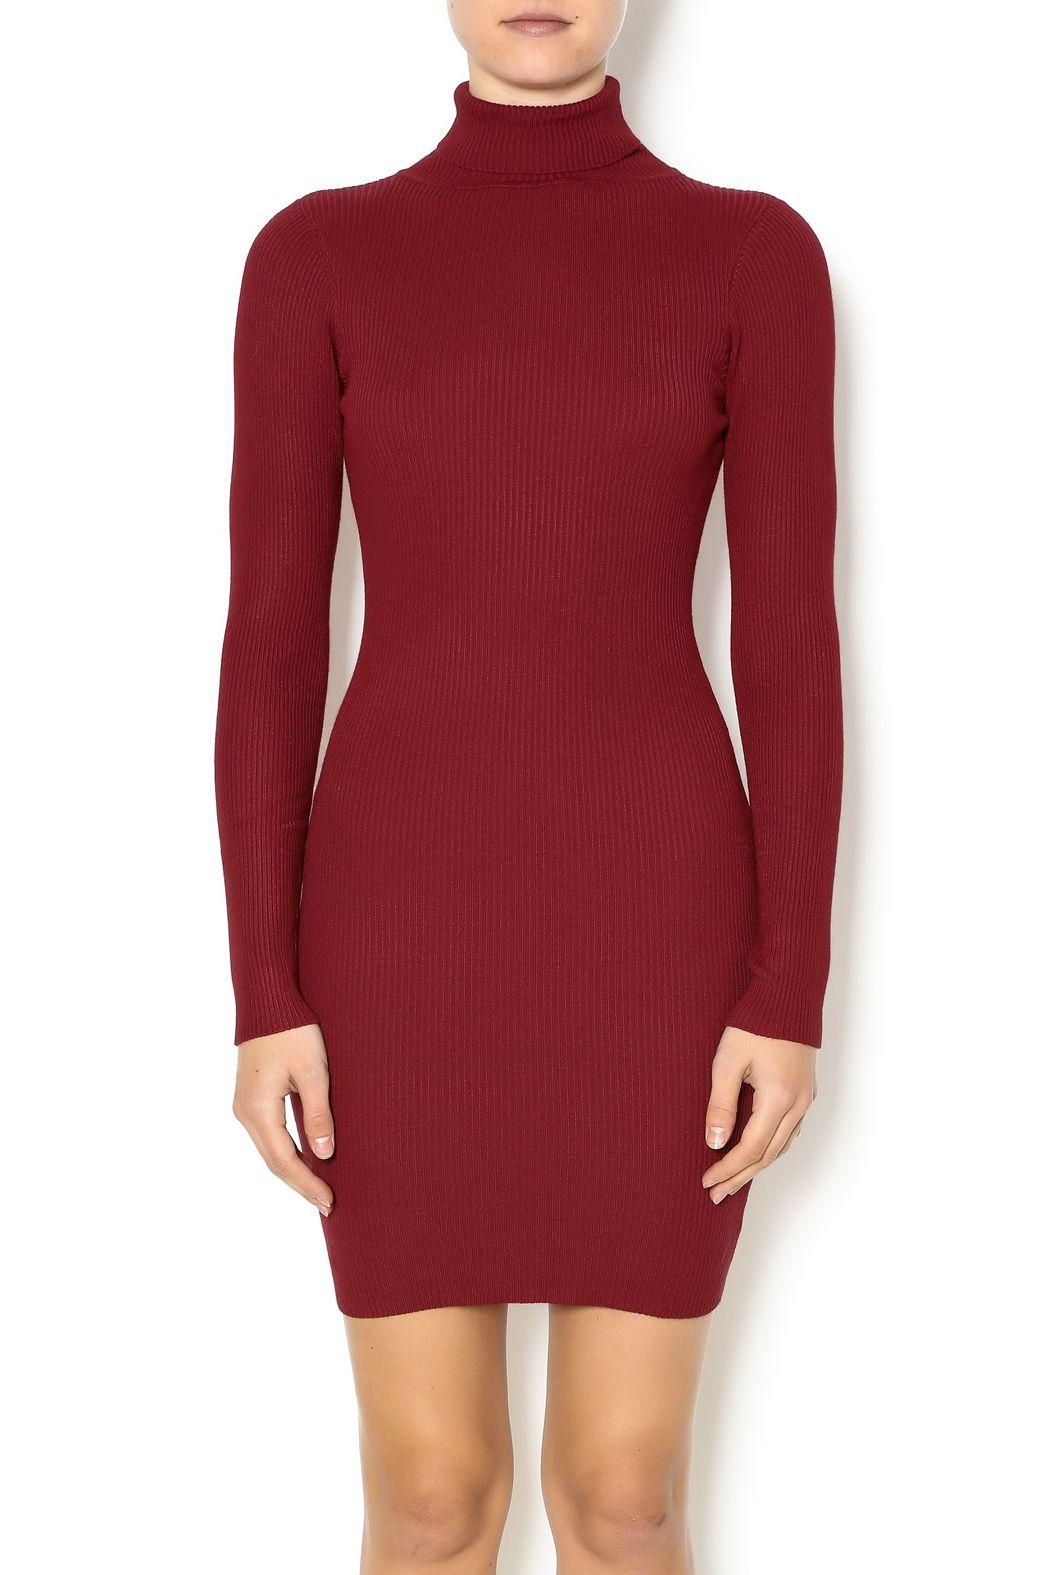 bc672cebe0 hera collection Burgundy Turtleneck Sweater Dress